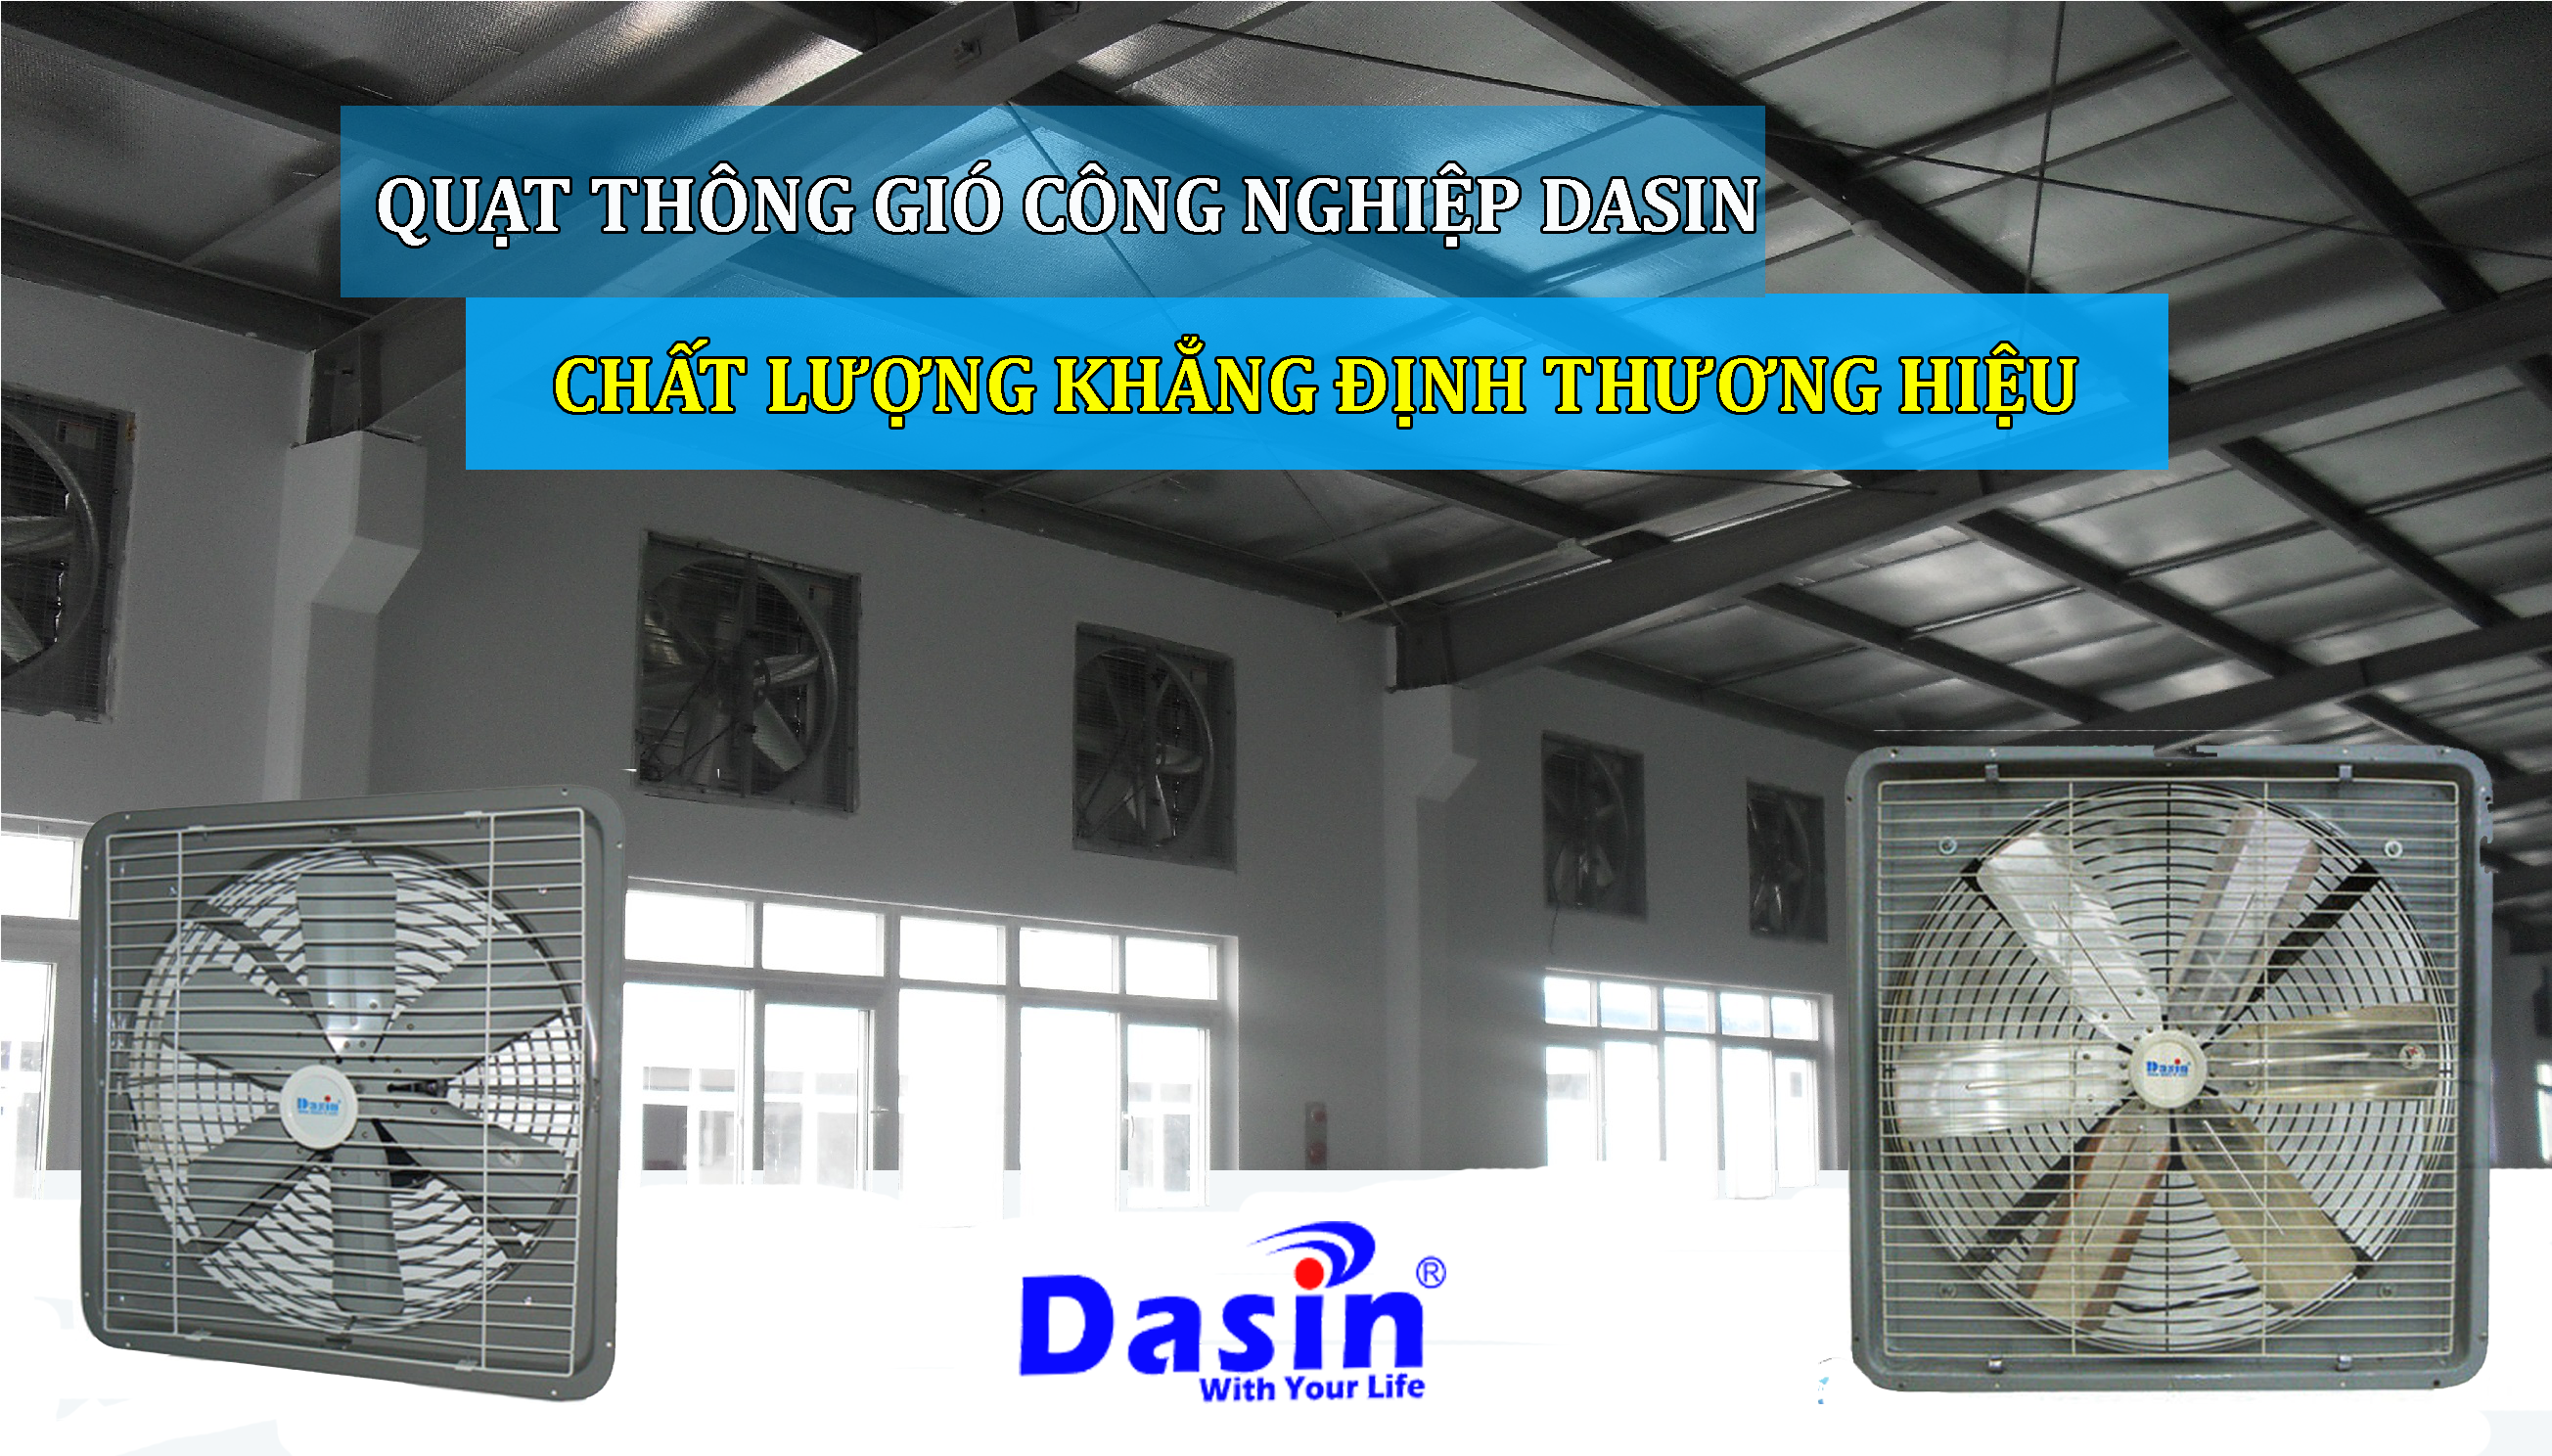 quat-thong-gio-cong-nghiep-dasin-1.png